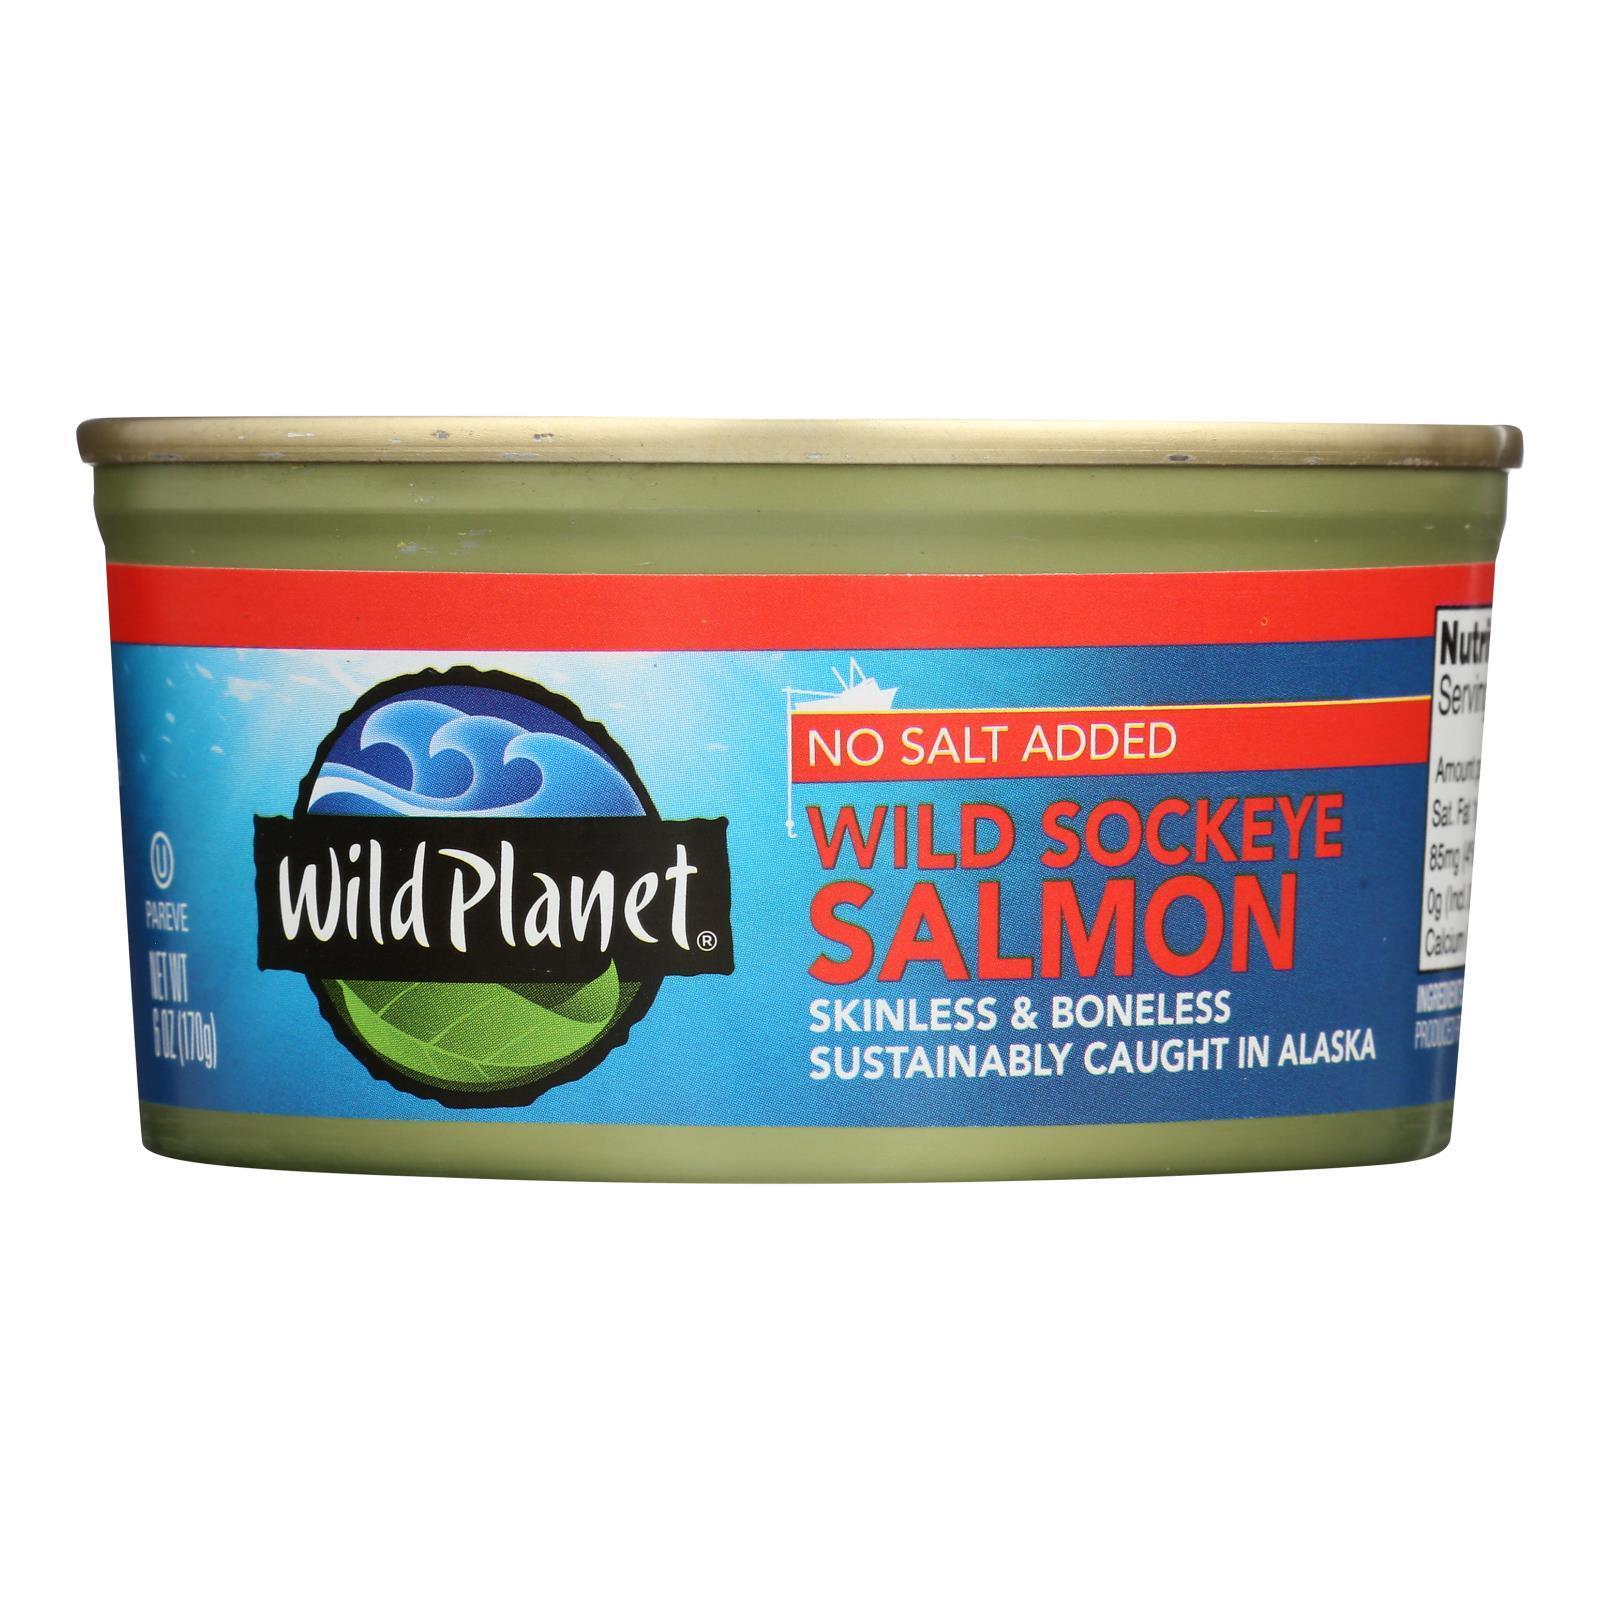 Wild Planet Wild Sockeye Salmon - No Salt Added - Case of 12 - 6 oz